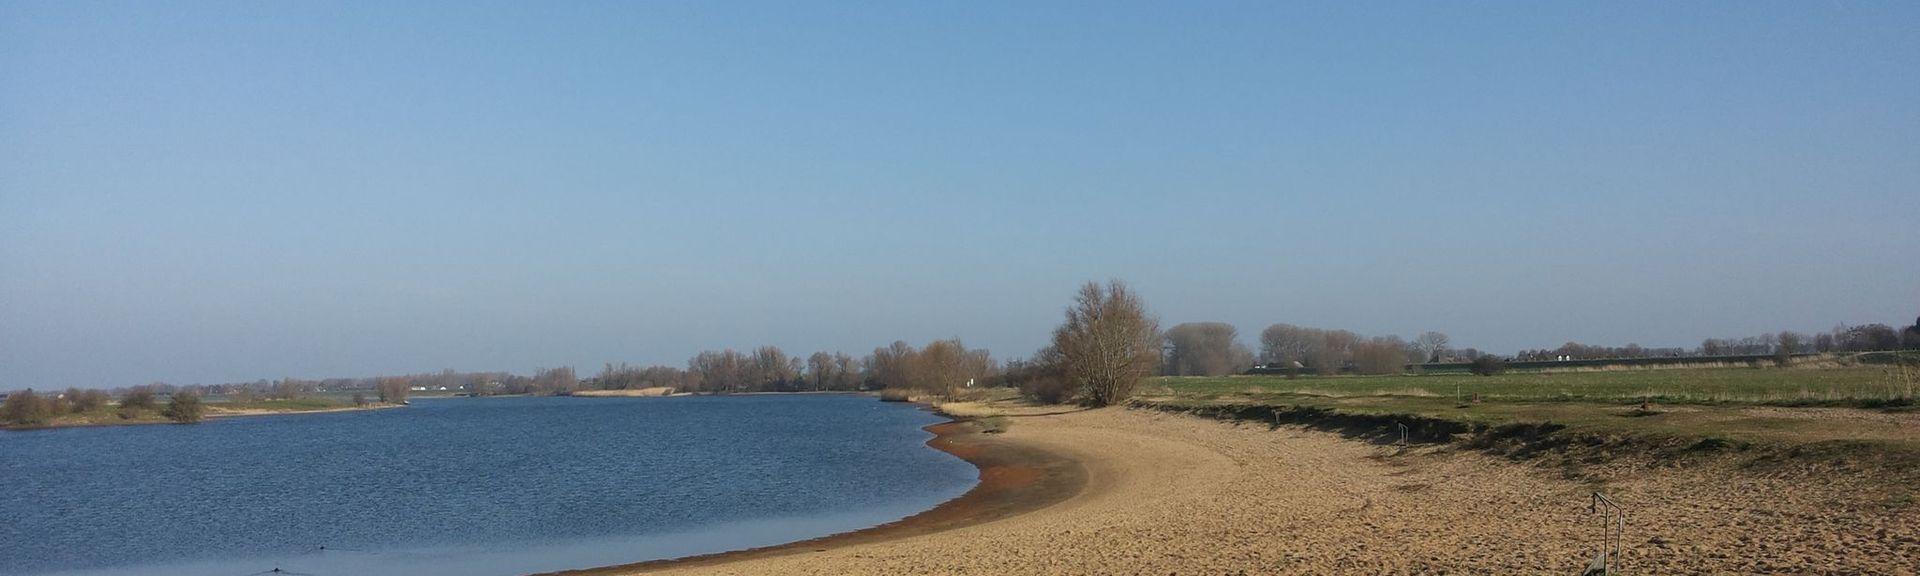 Zeldenrust (moulin à vent), Oss, Brabant-du-Nord, Pays-Bas